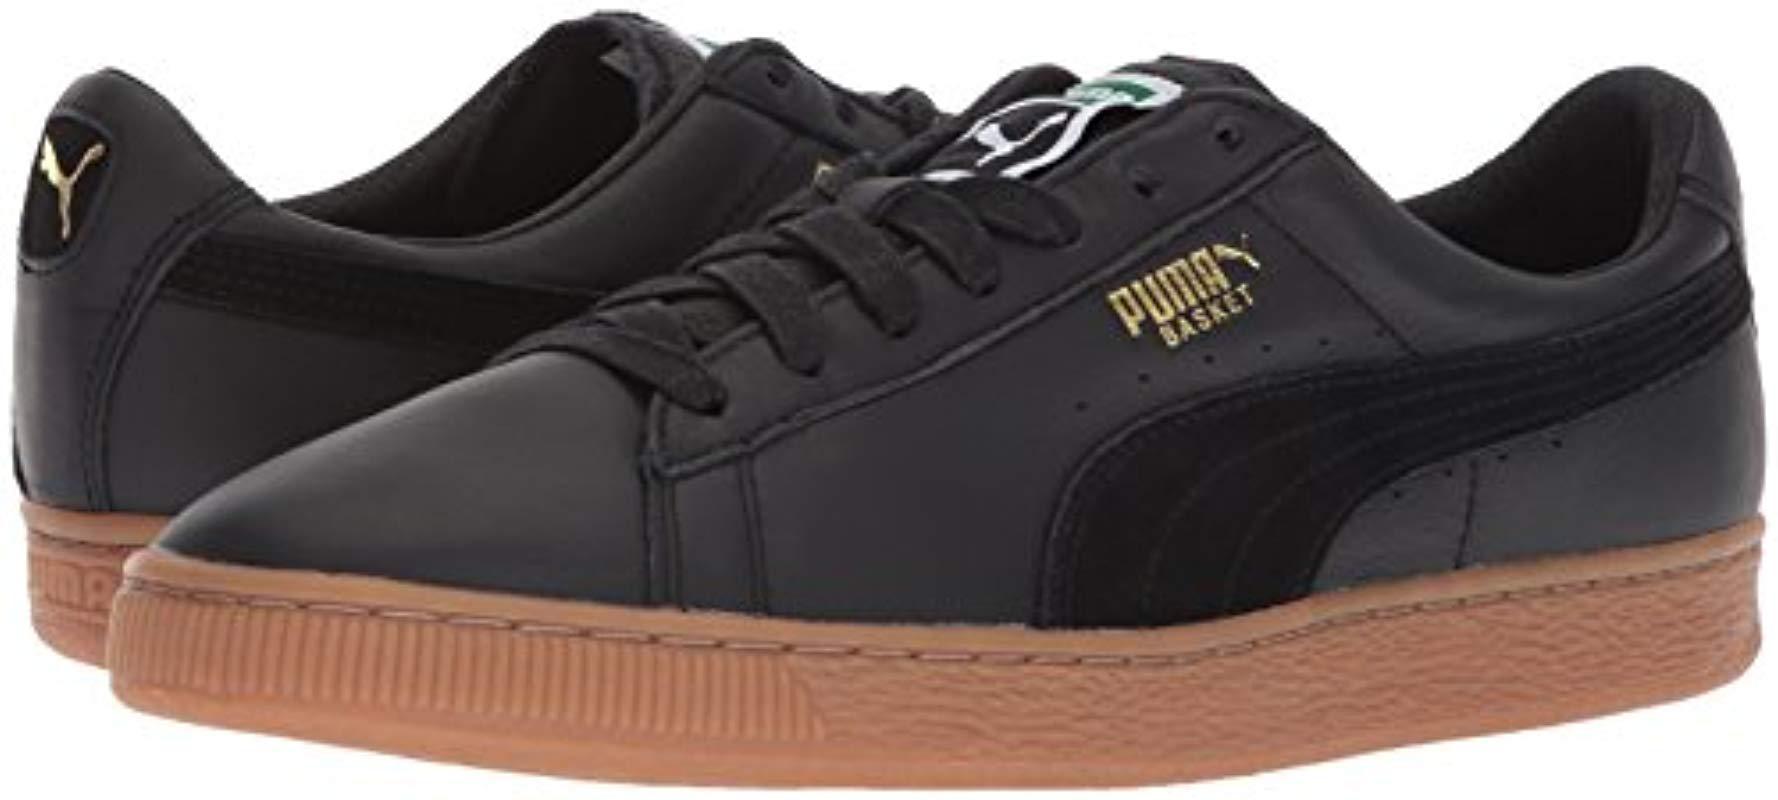 new arrival 93b60 7644d PUMA Basket Classic Gum Deluxe Sneaker in Black for Men - Lyst